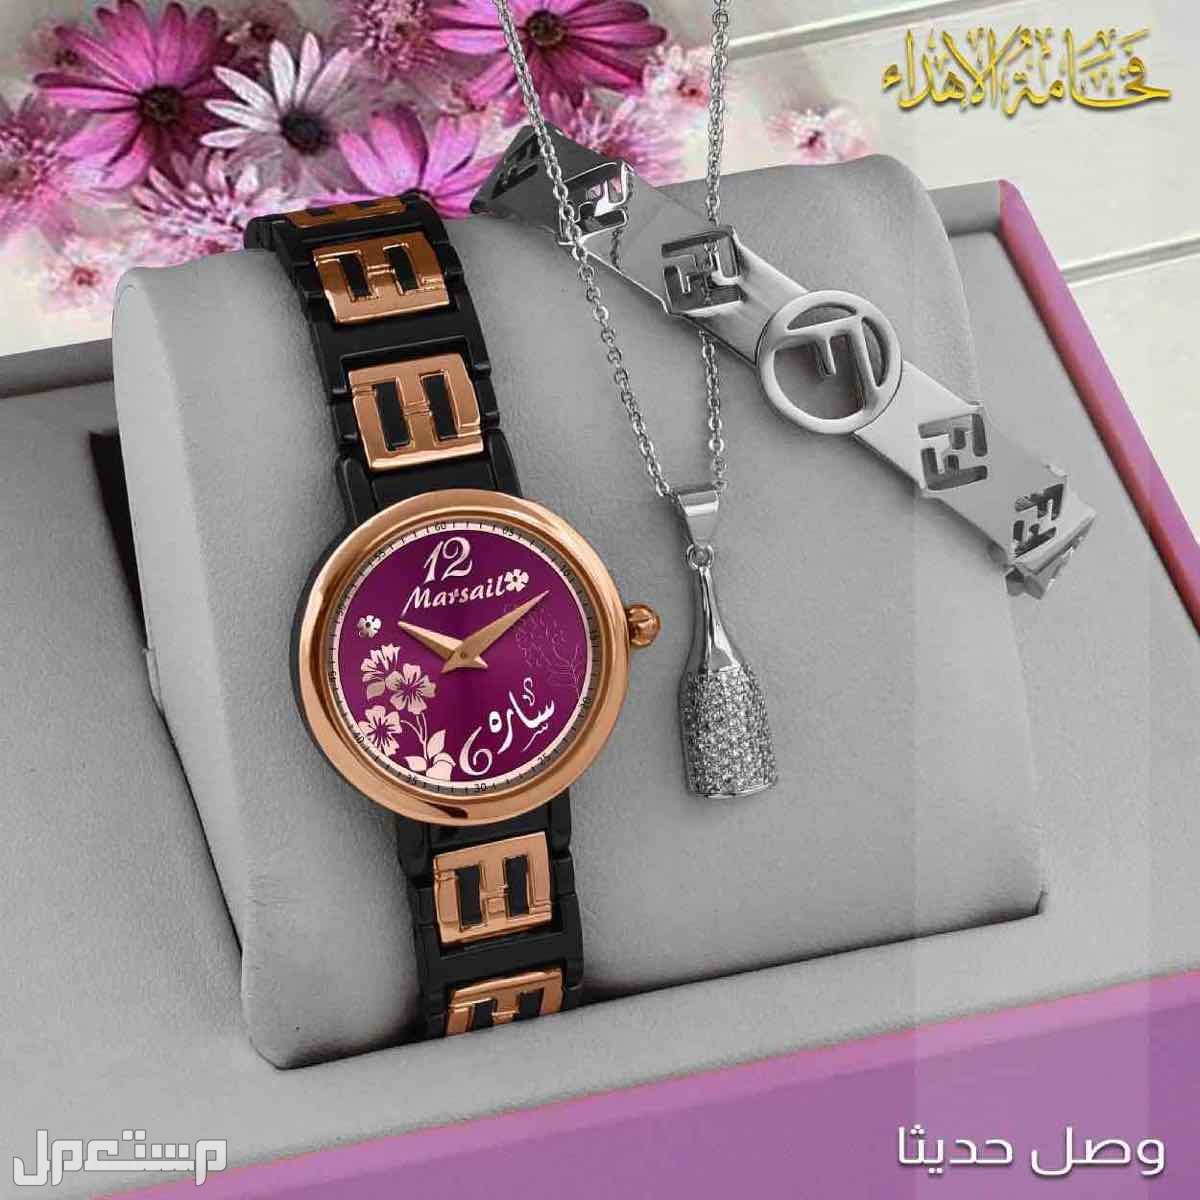 طقم ساعه نسائي ساعه اكسسوار اساور خاتم تصميم الاسم بالطلب